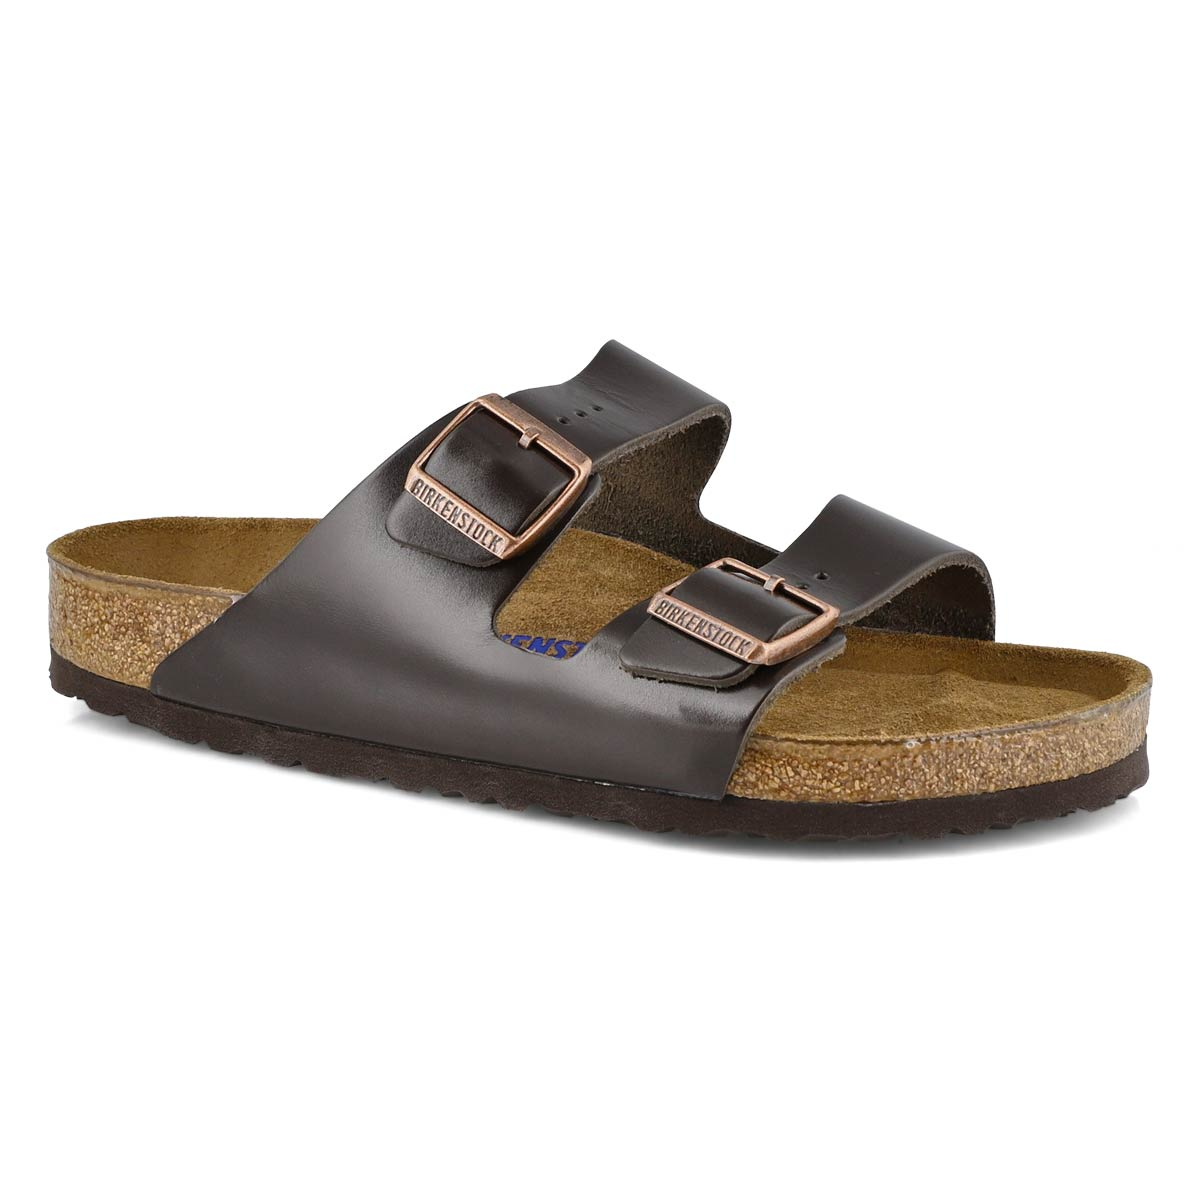 Men's Arizona Sandal - Brown